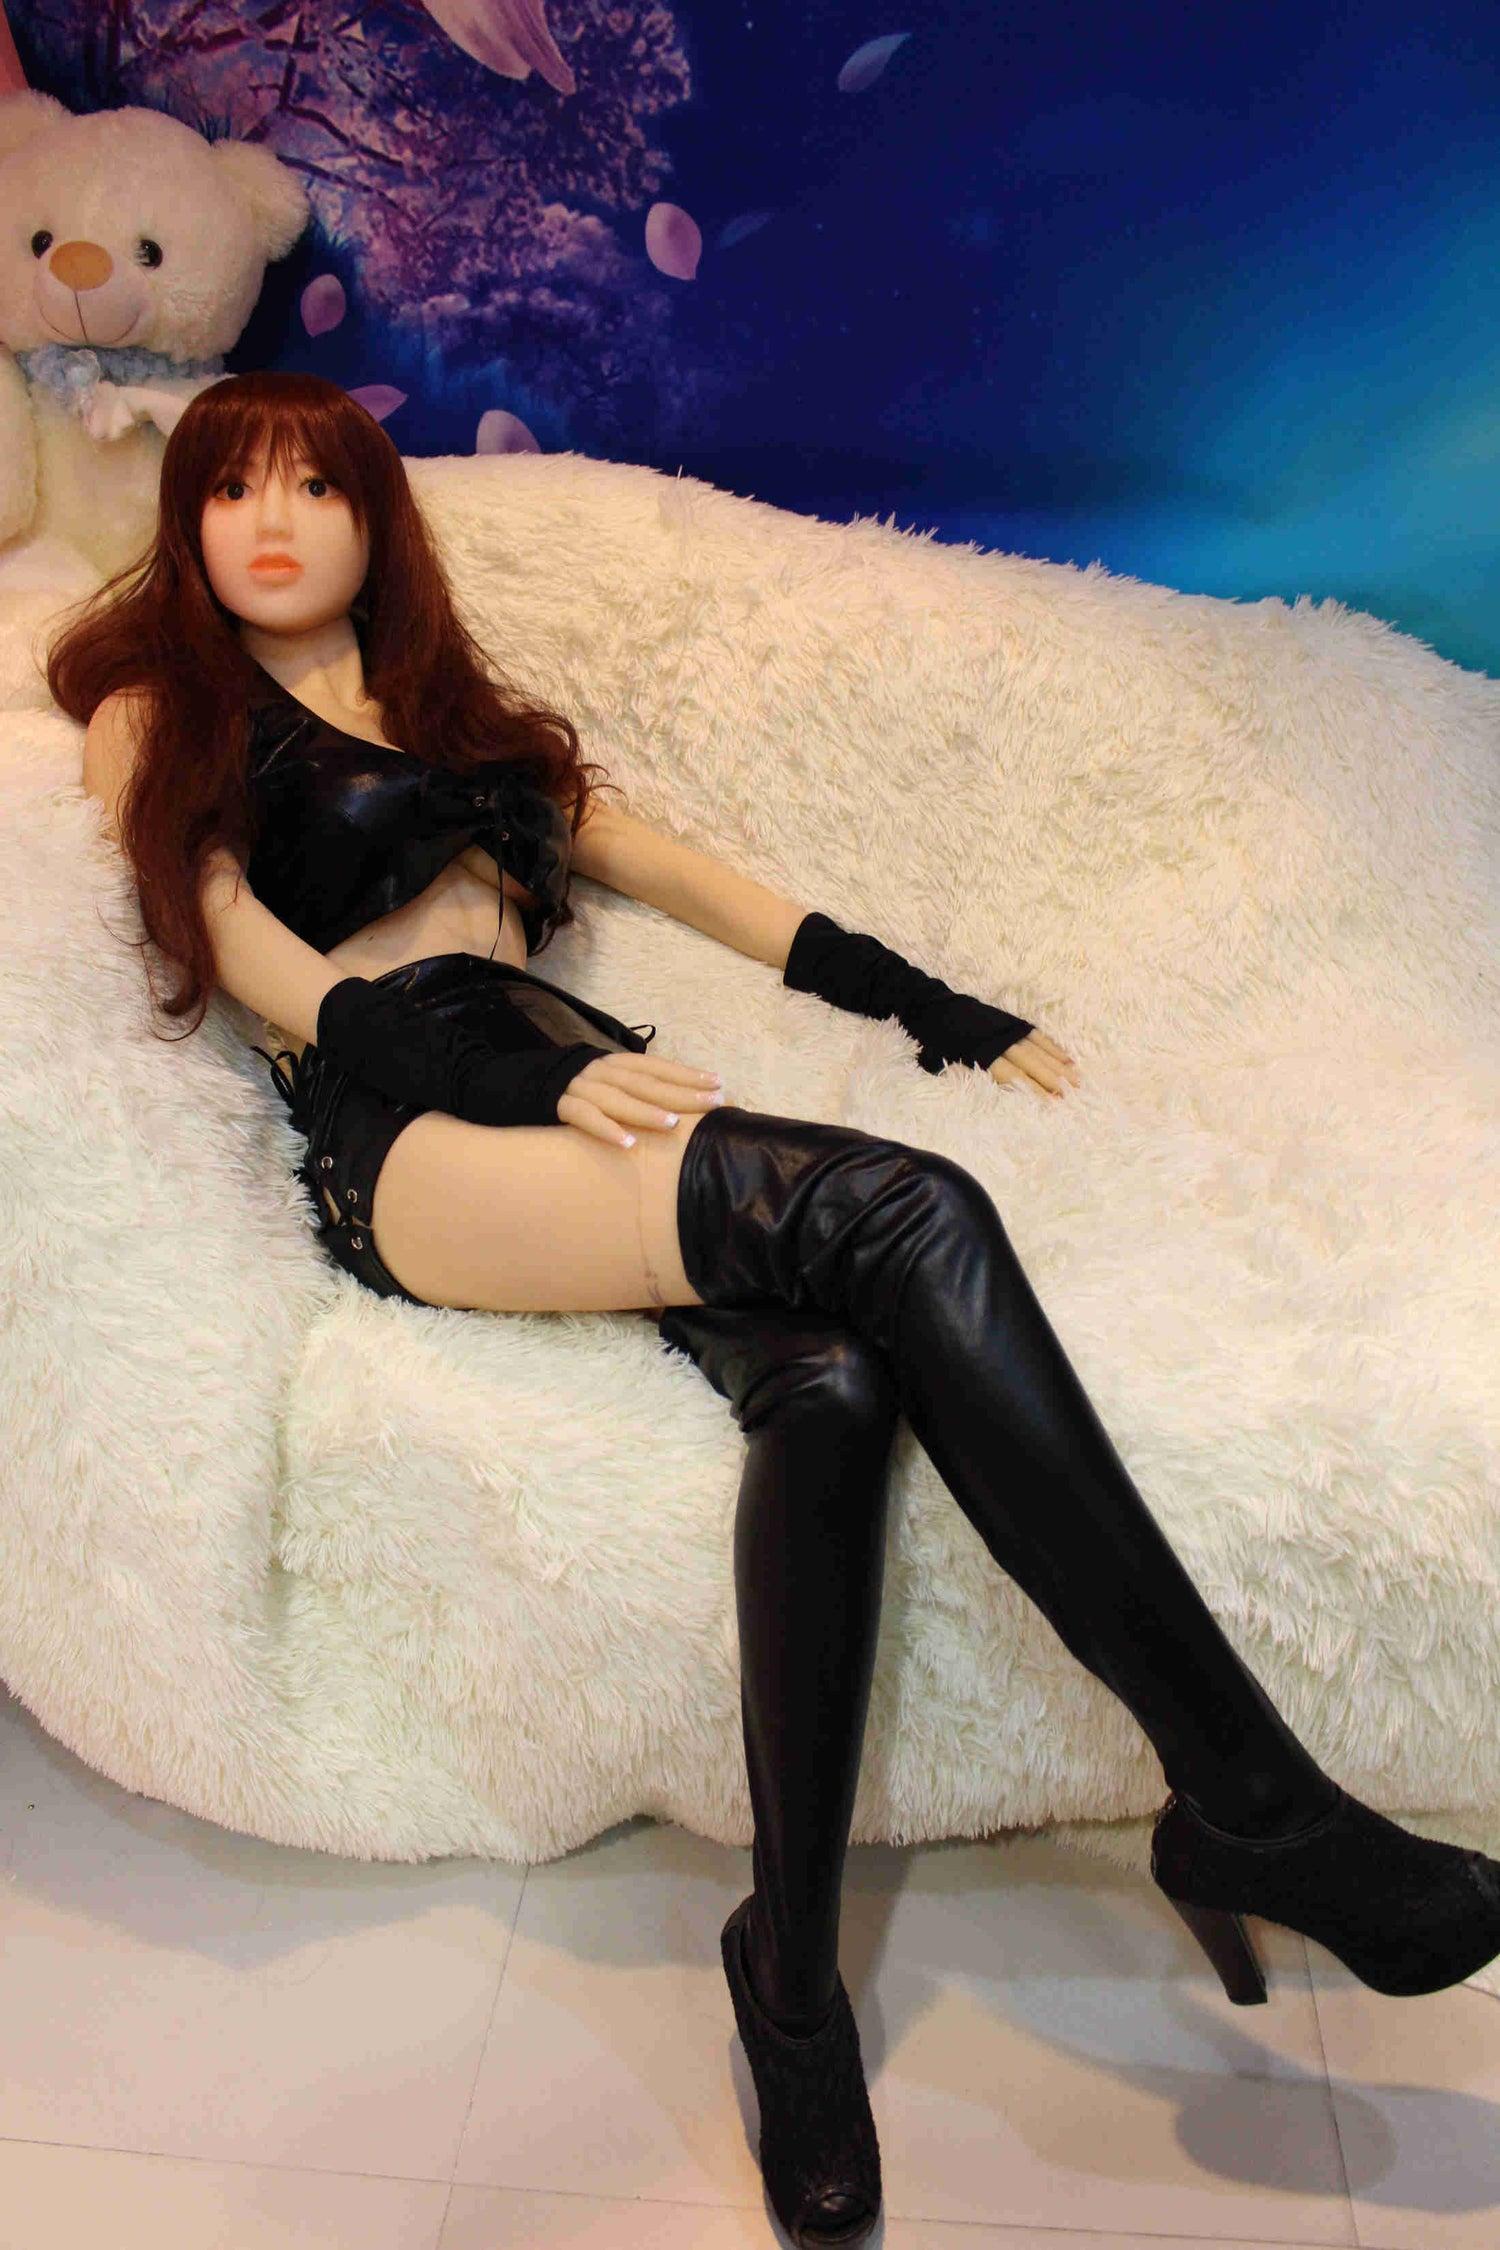 Image of [#019] BIG SALE | Full Sized Realistic Heating & Intelligent Silicone Sex Dolls – Ayane 158cm